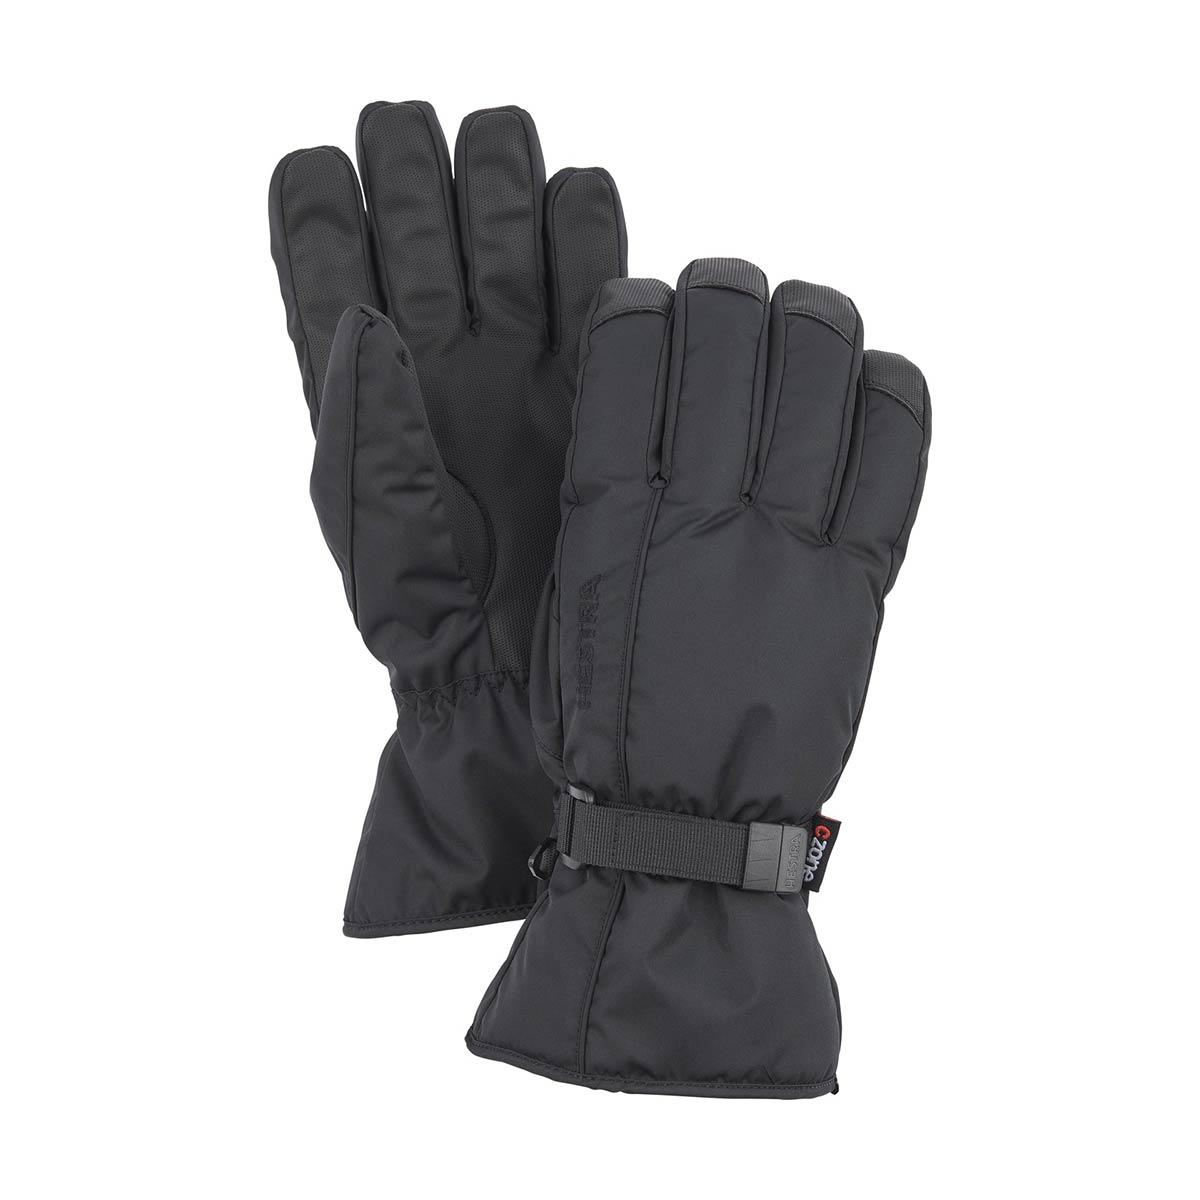 Hestra  Isaberg CZone Jr - 5 finger